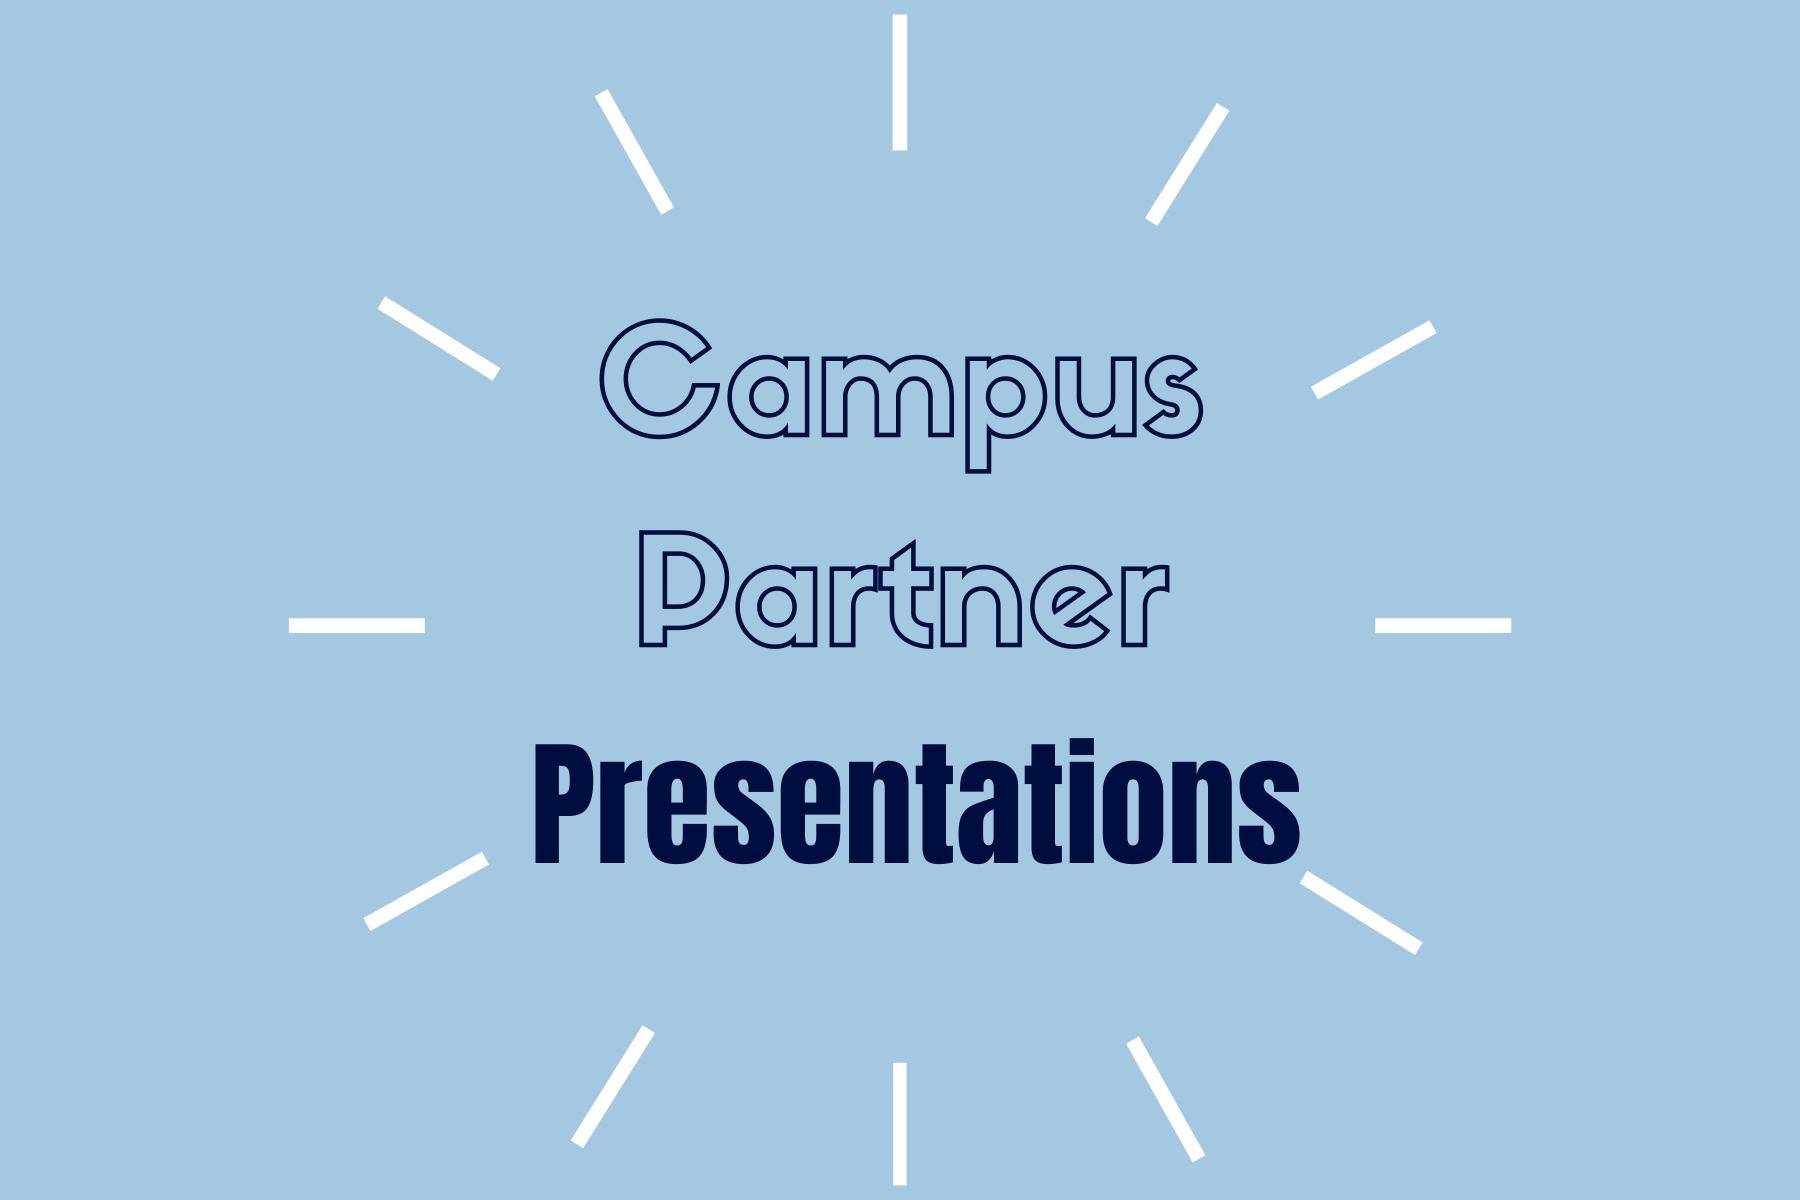 Campus Partner Presentations